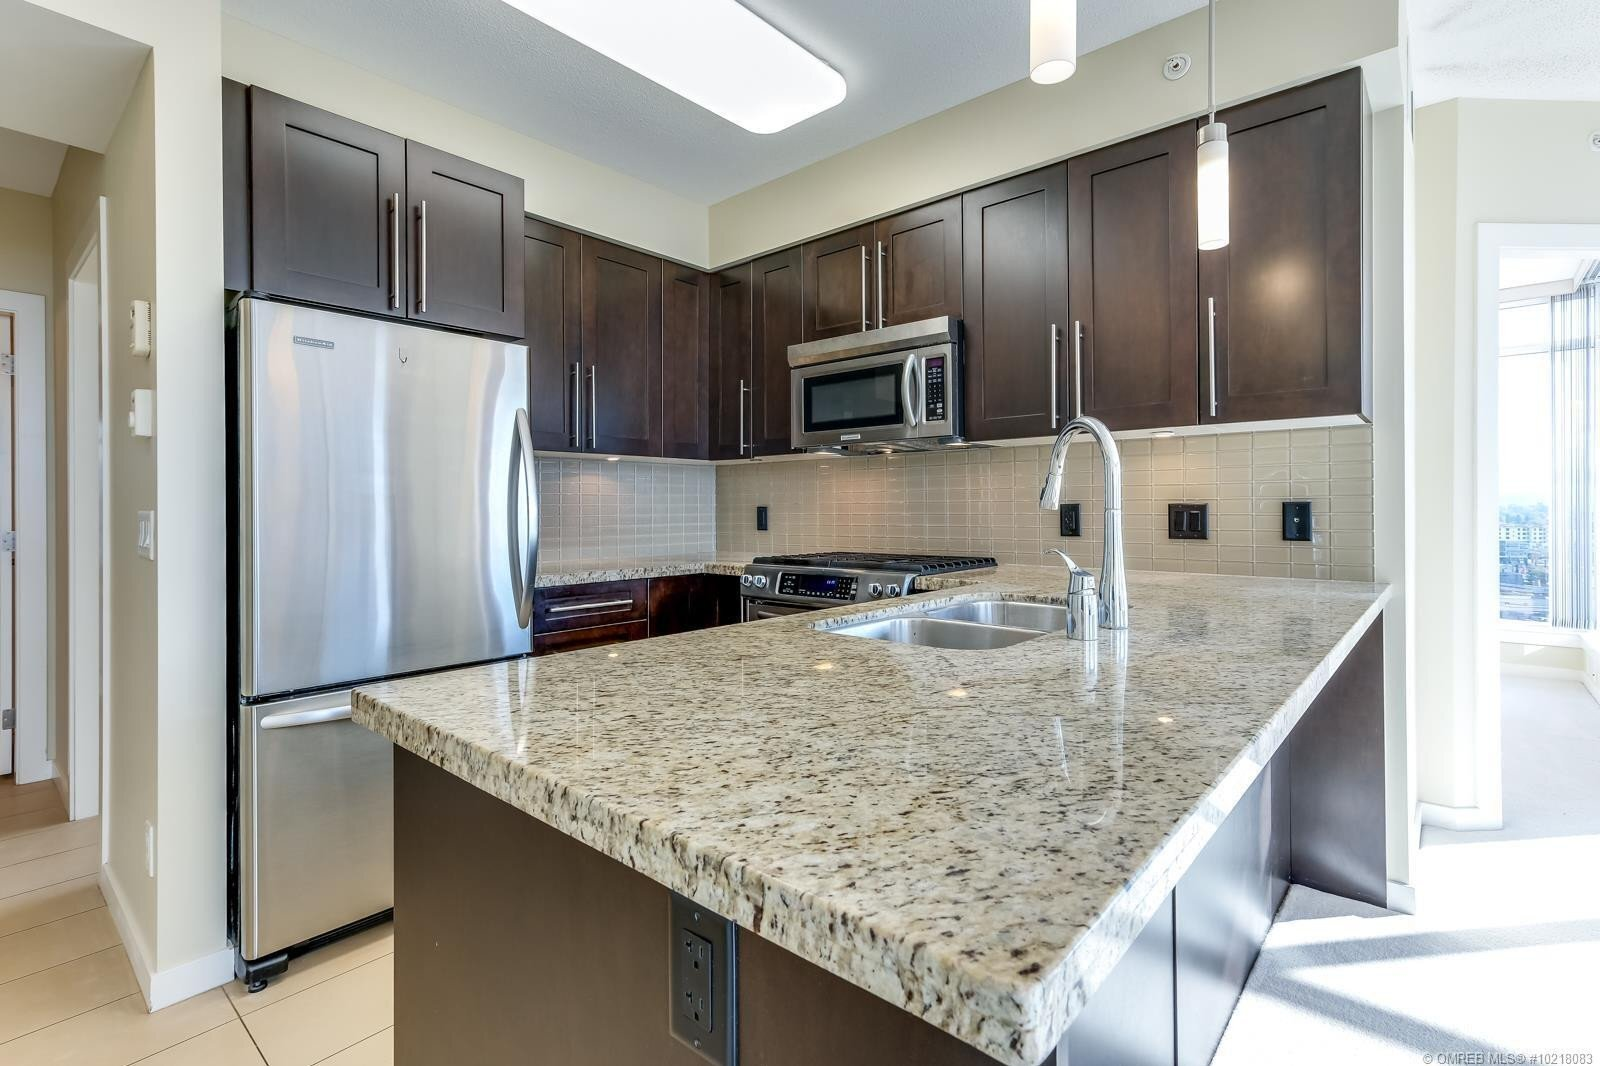 Condo for sale at 1075 Sunset Dr Unit 1406 Kelowna British Columbia - MLS: 10218083